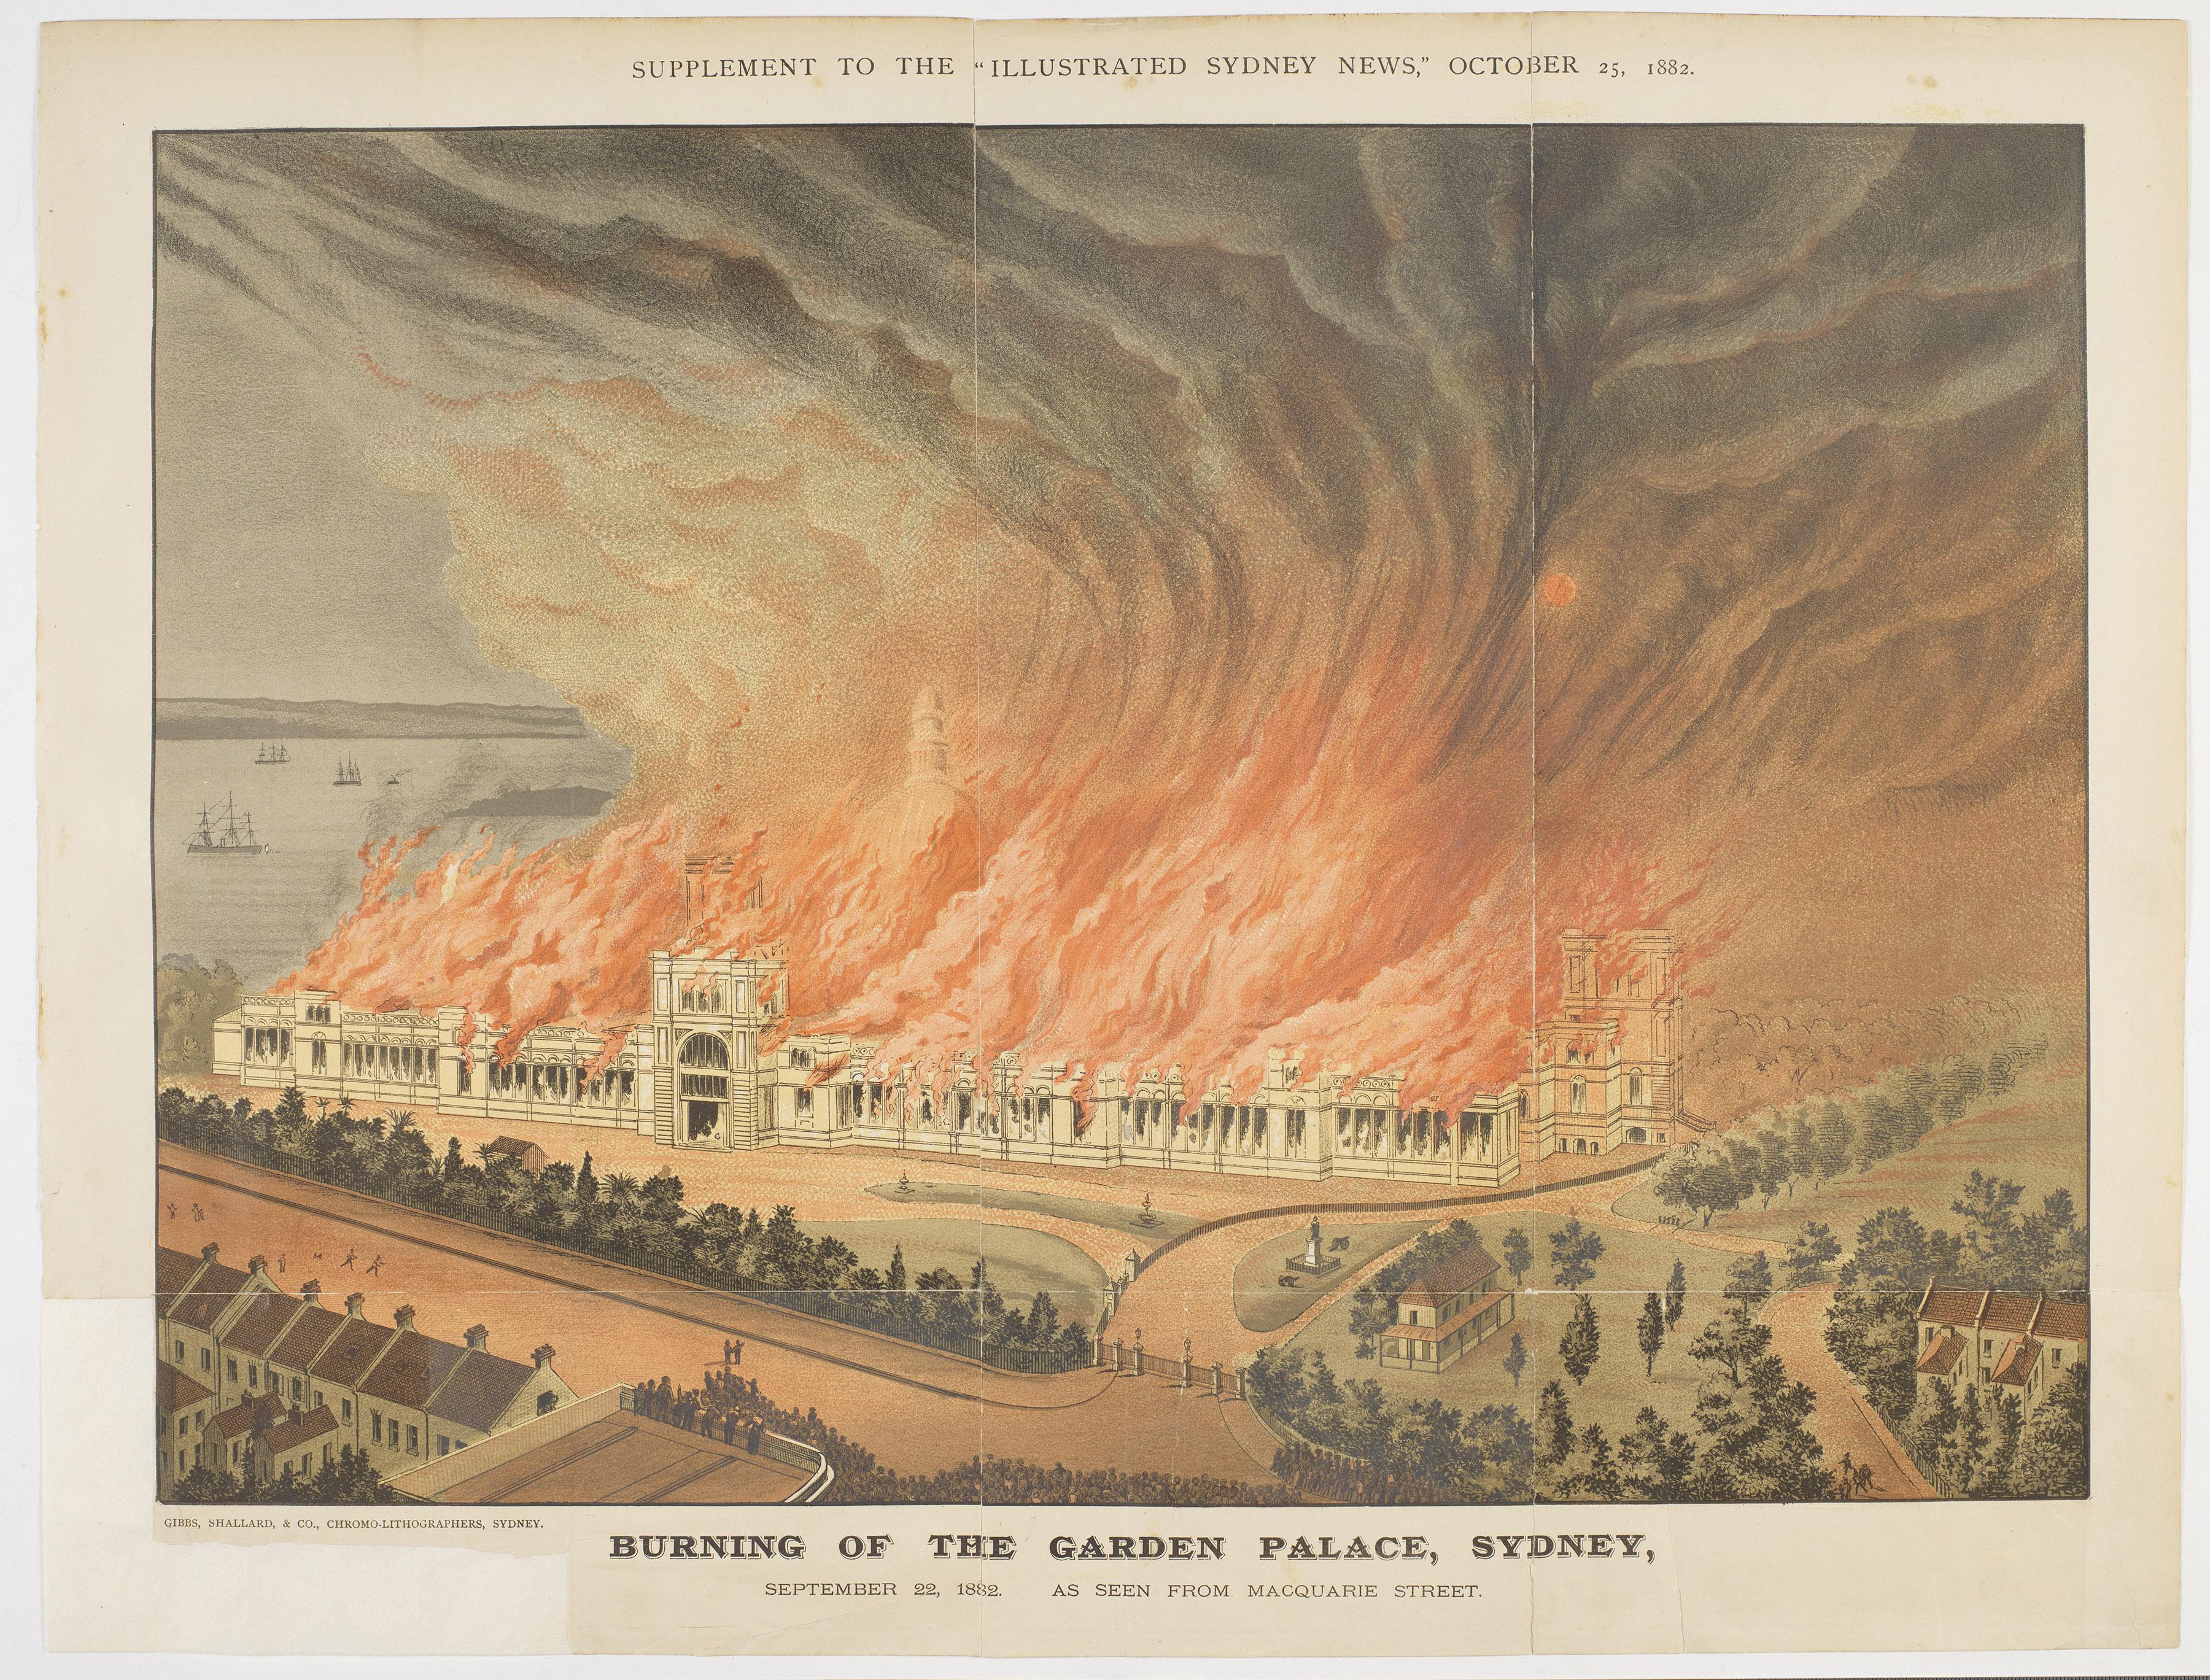 Garden Palace burning